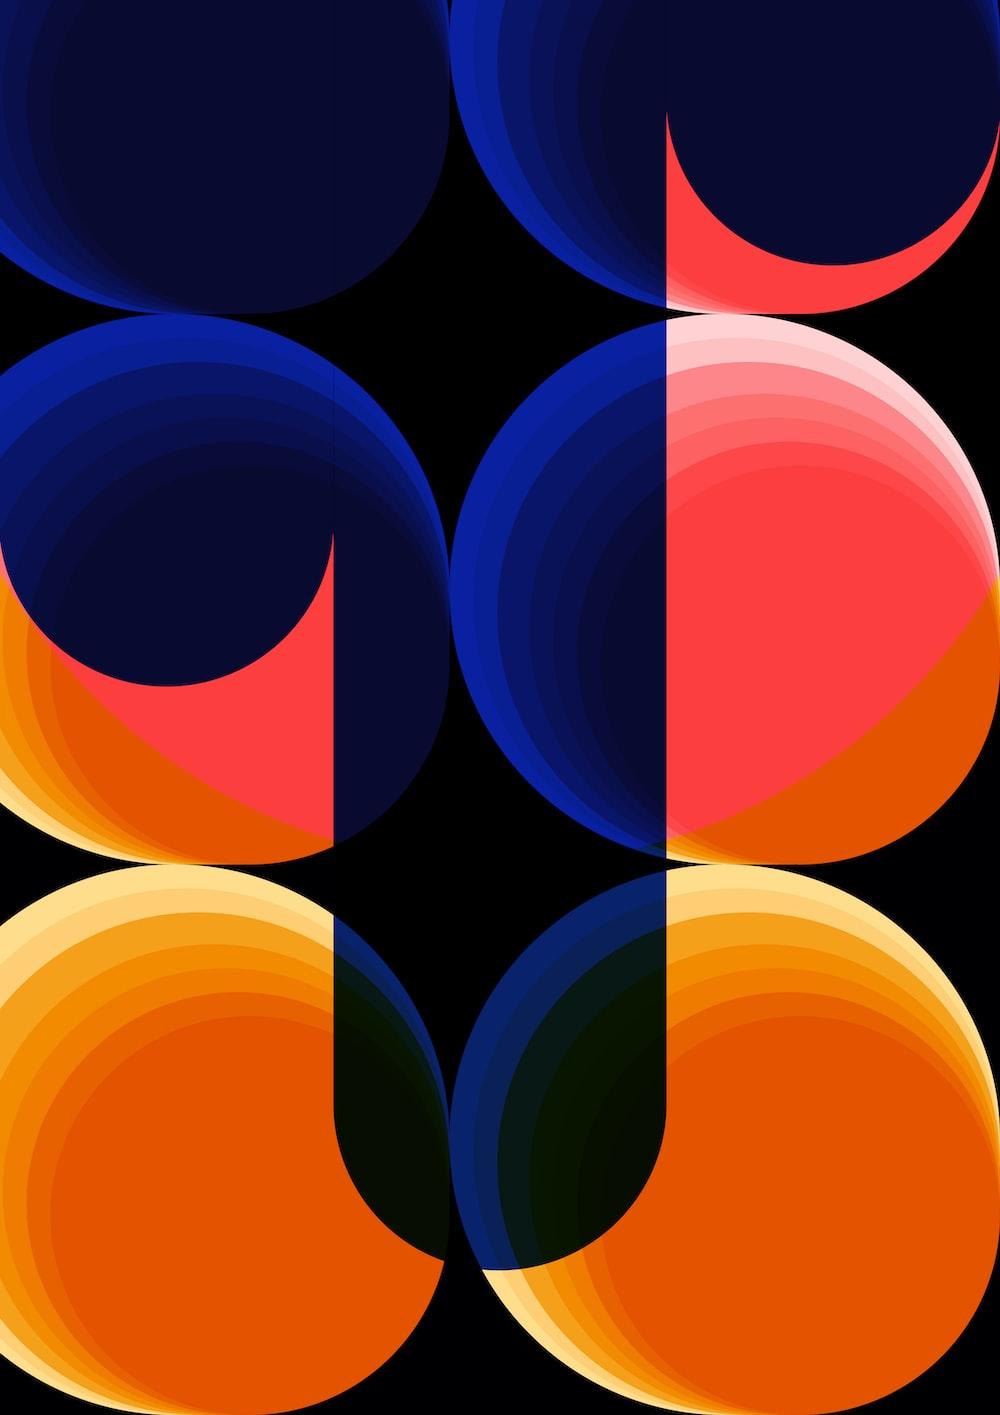 blue orange and red round lights